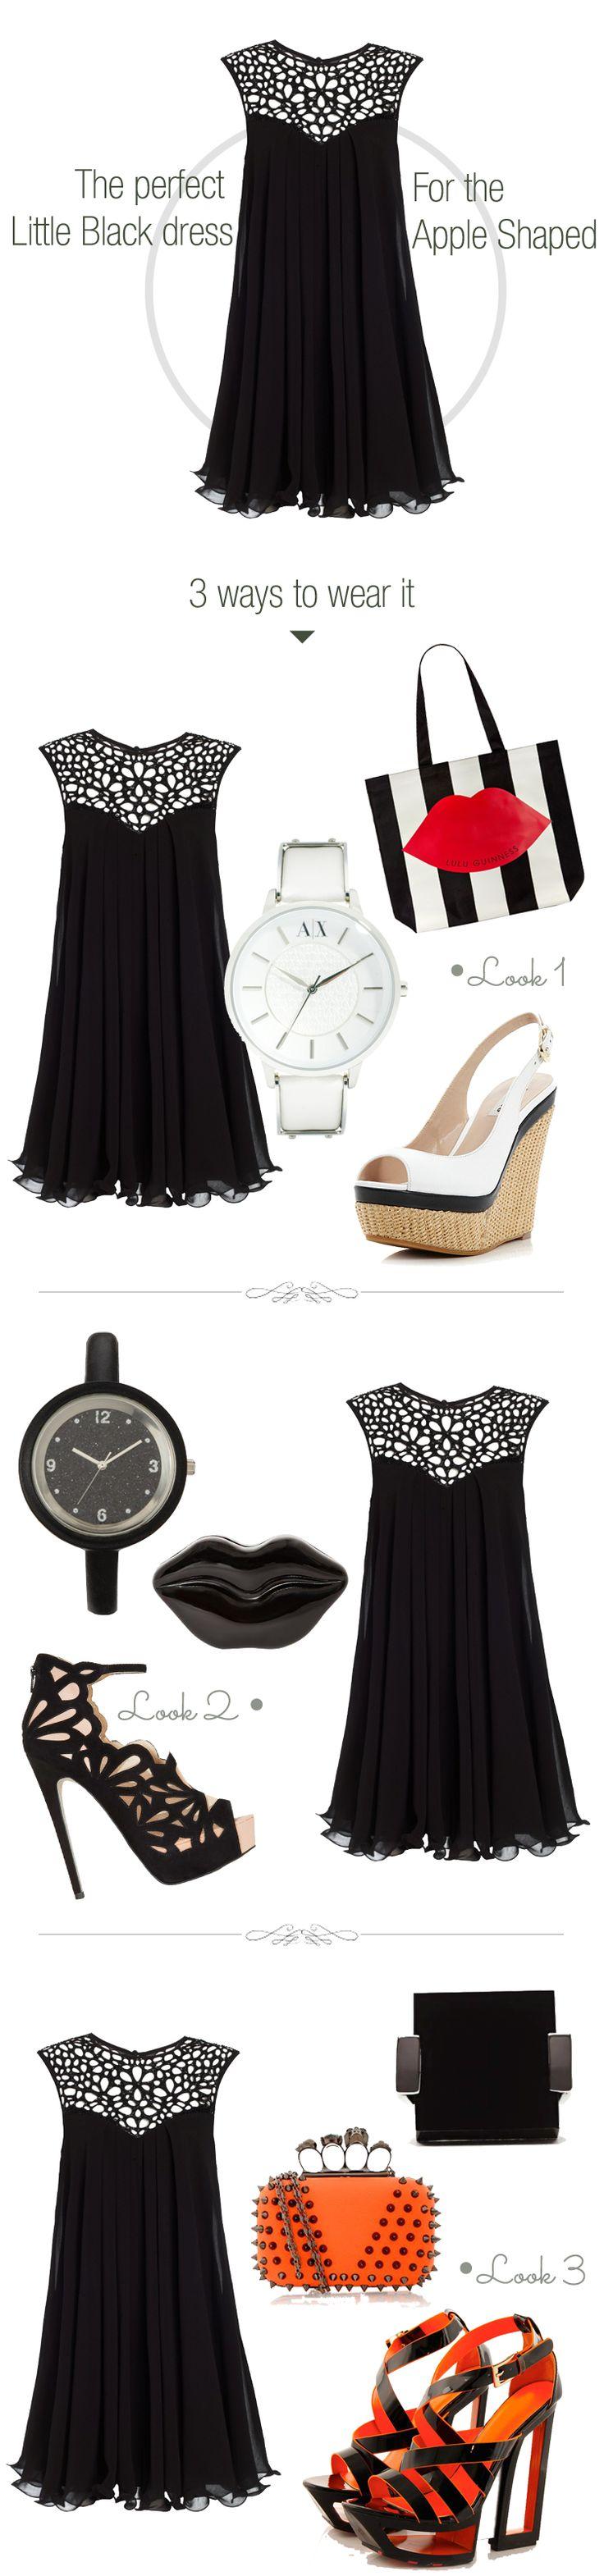 the-best-little-black-dress-for-the-Apple-shaped